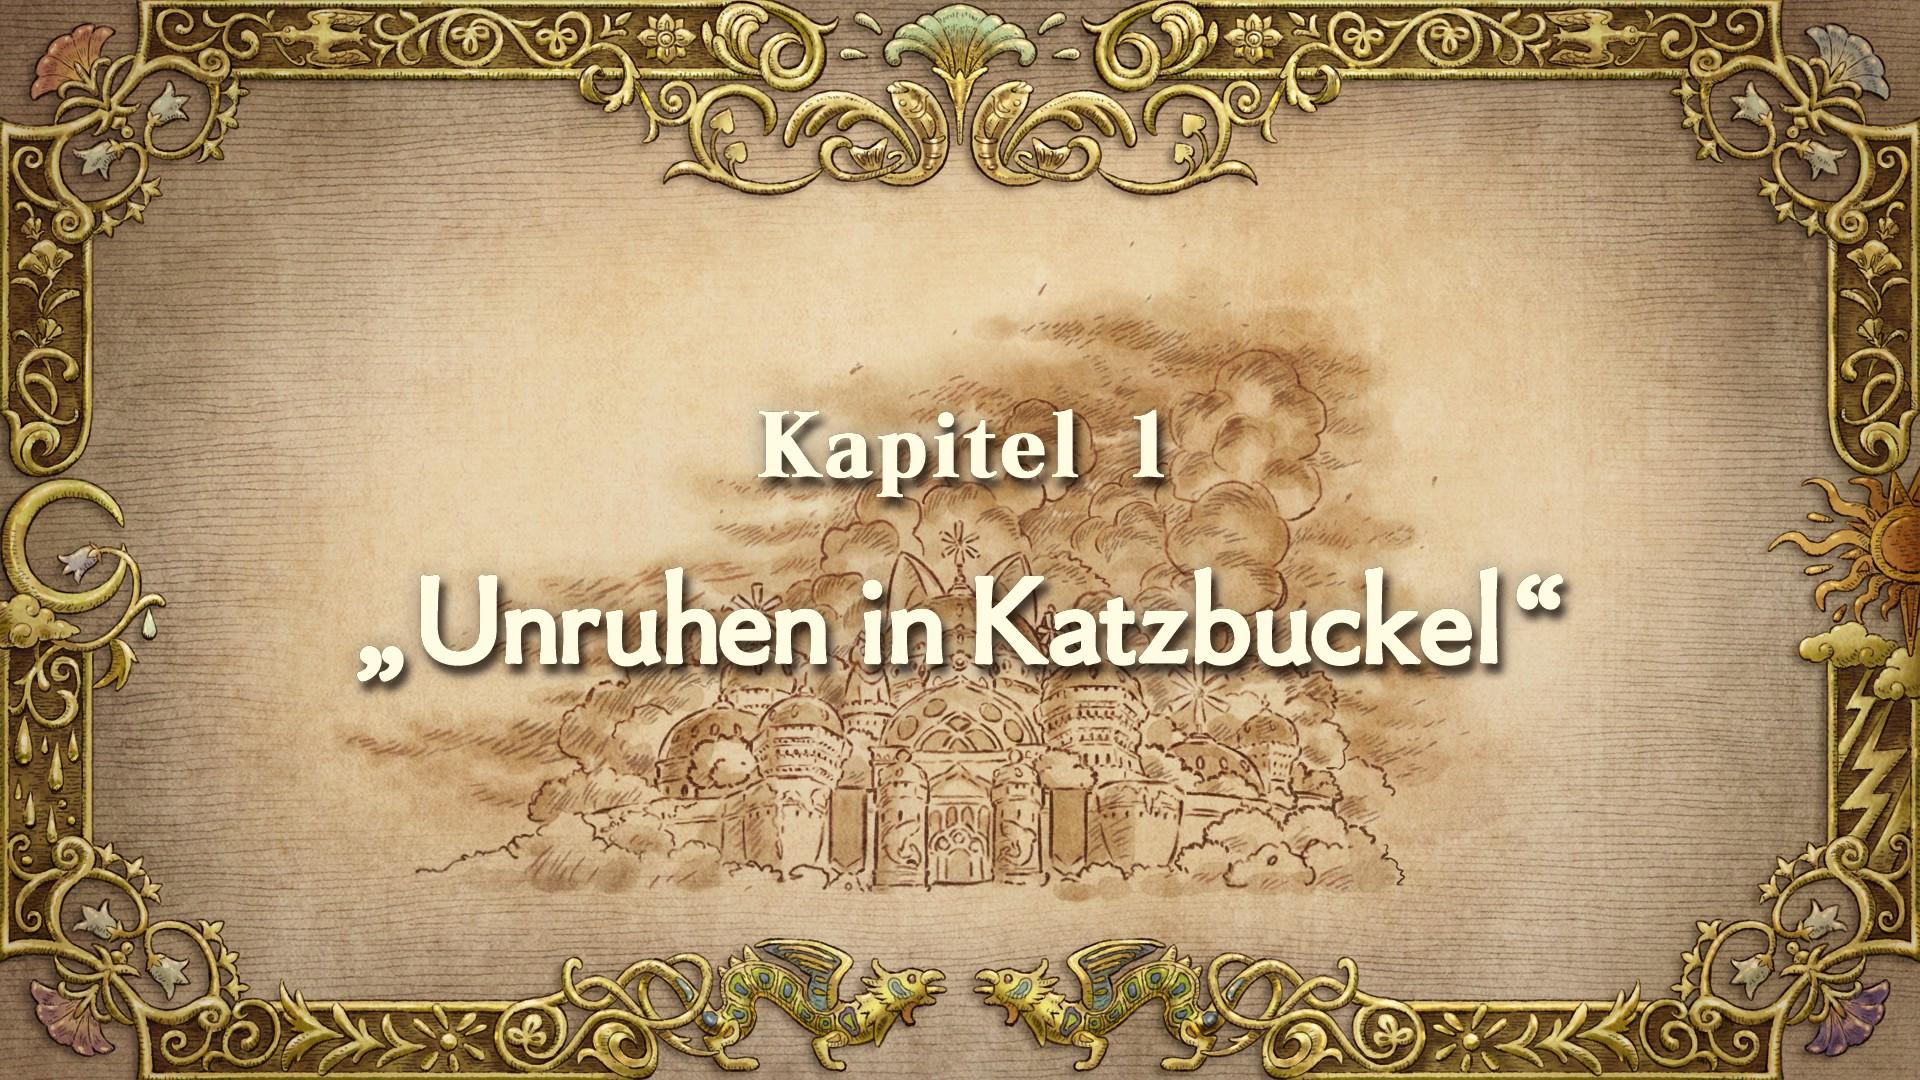 Unruhen in Katzbuckel | Ni no Kuni Wiki | FANDOM powered by